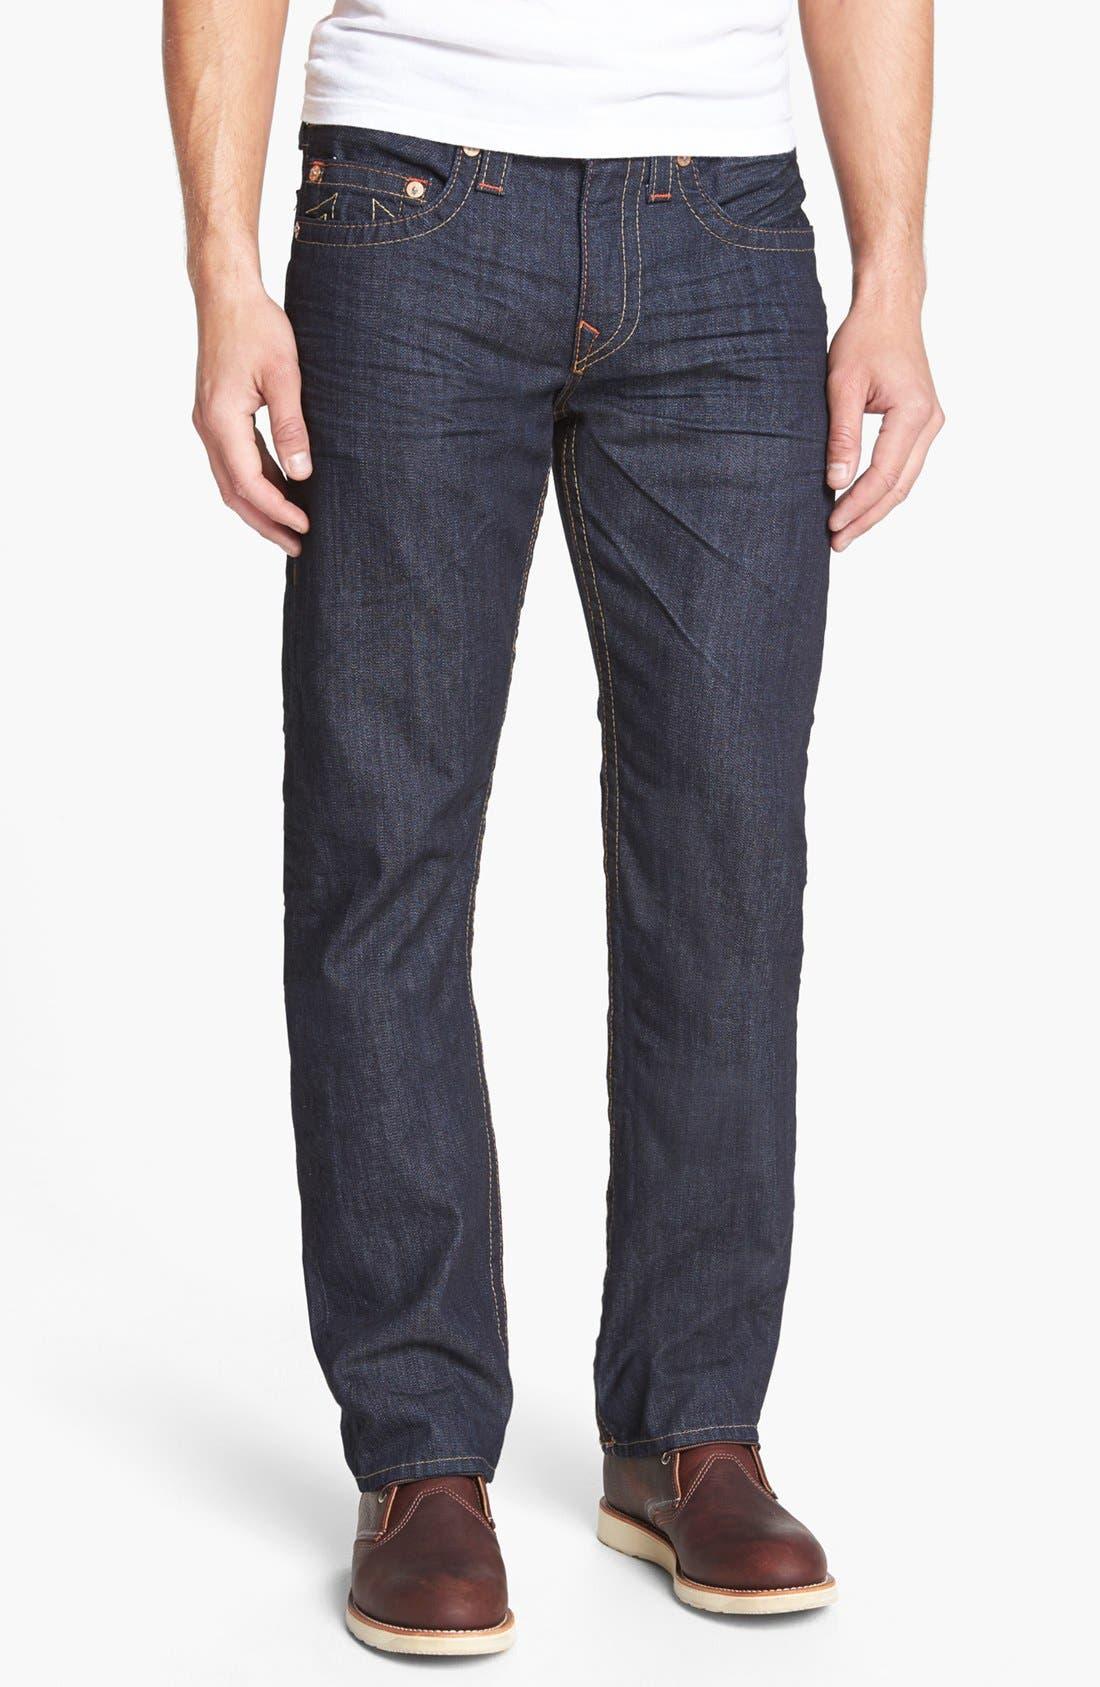 Alternate Image 2  - True Religion Brand Jeans 'Bobby' Straight Leg Jeans (Bz Inglorious)